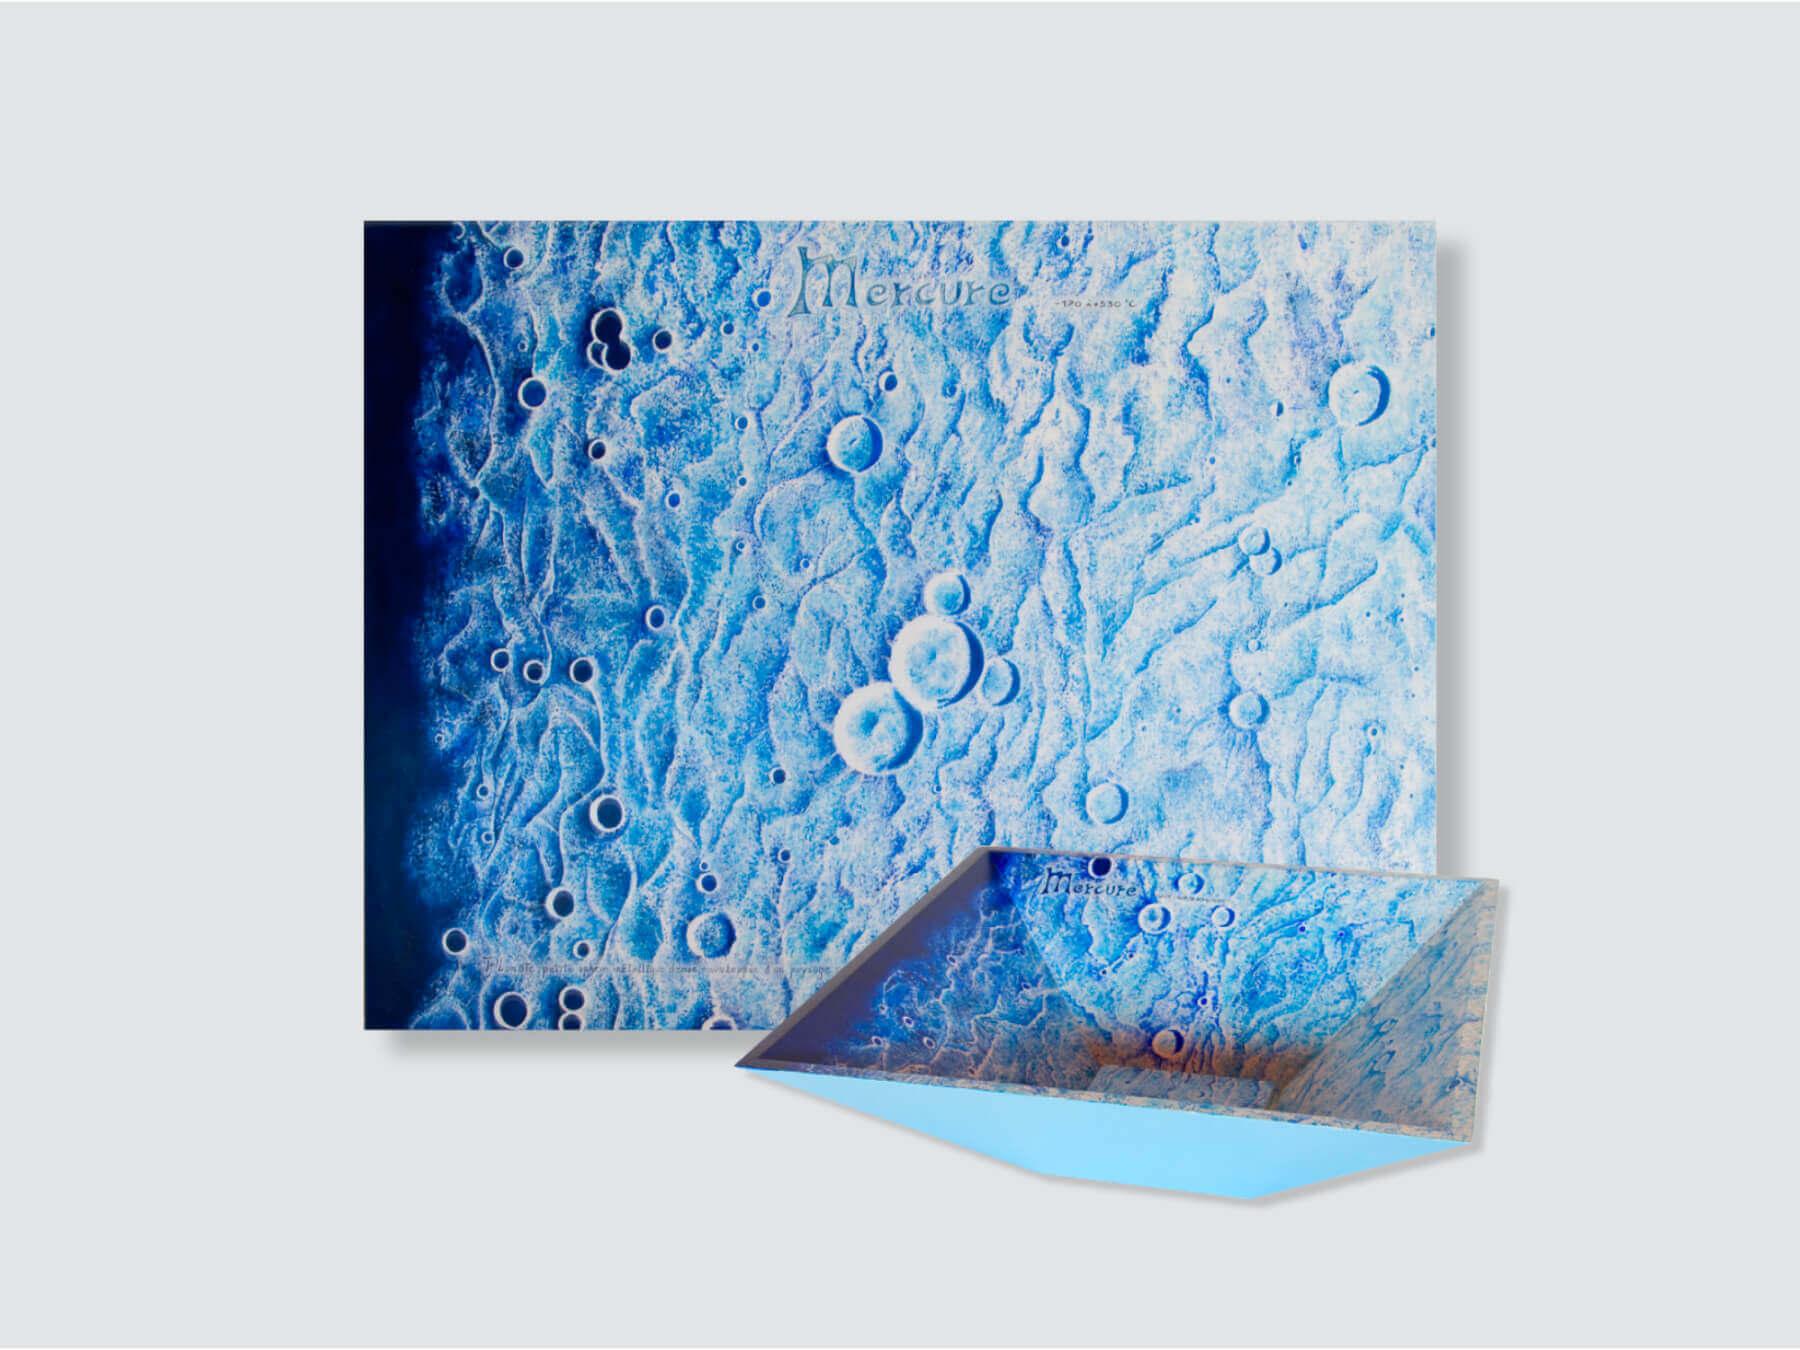 """Mercure Planet"" Painting & Pyramidal Bowl- 92x70x5cm + 45x45x15cm / 36.2x27.5x2 in + 17.7x17.7x5.9 in"